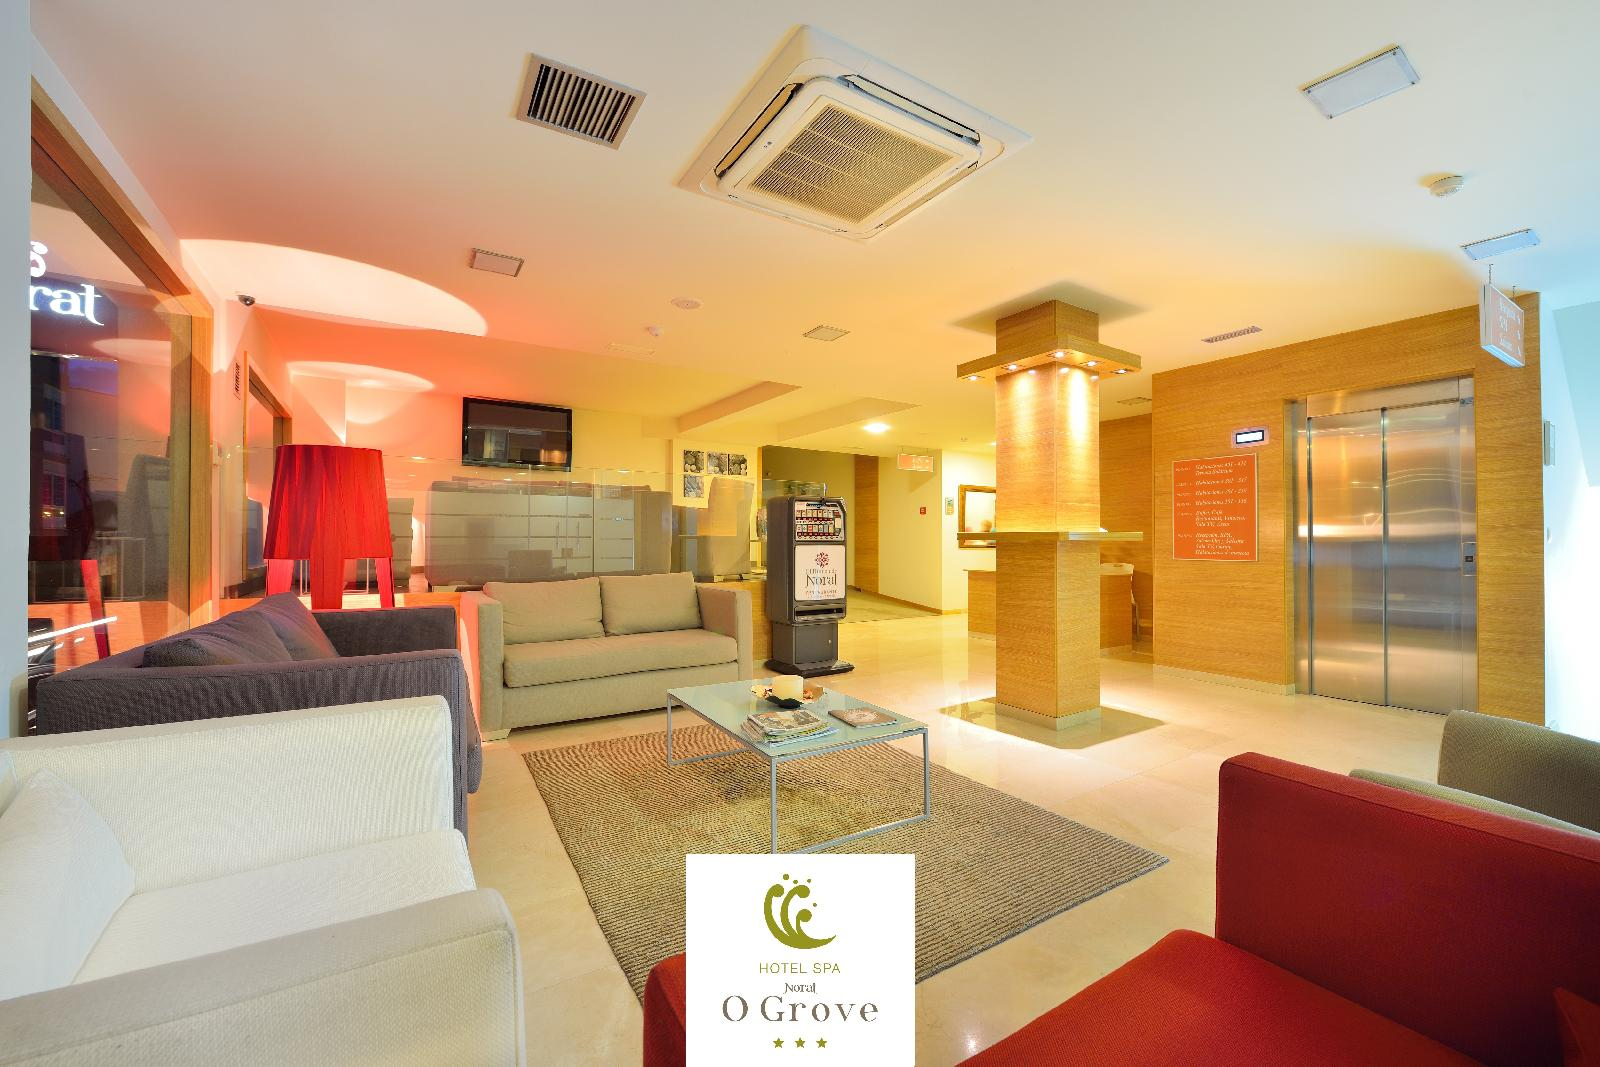 8. Hotel Spa Norat O Grove